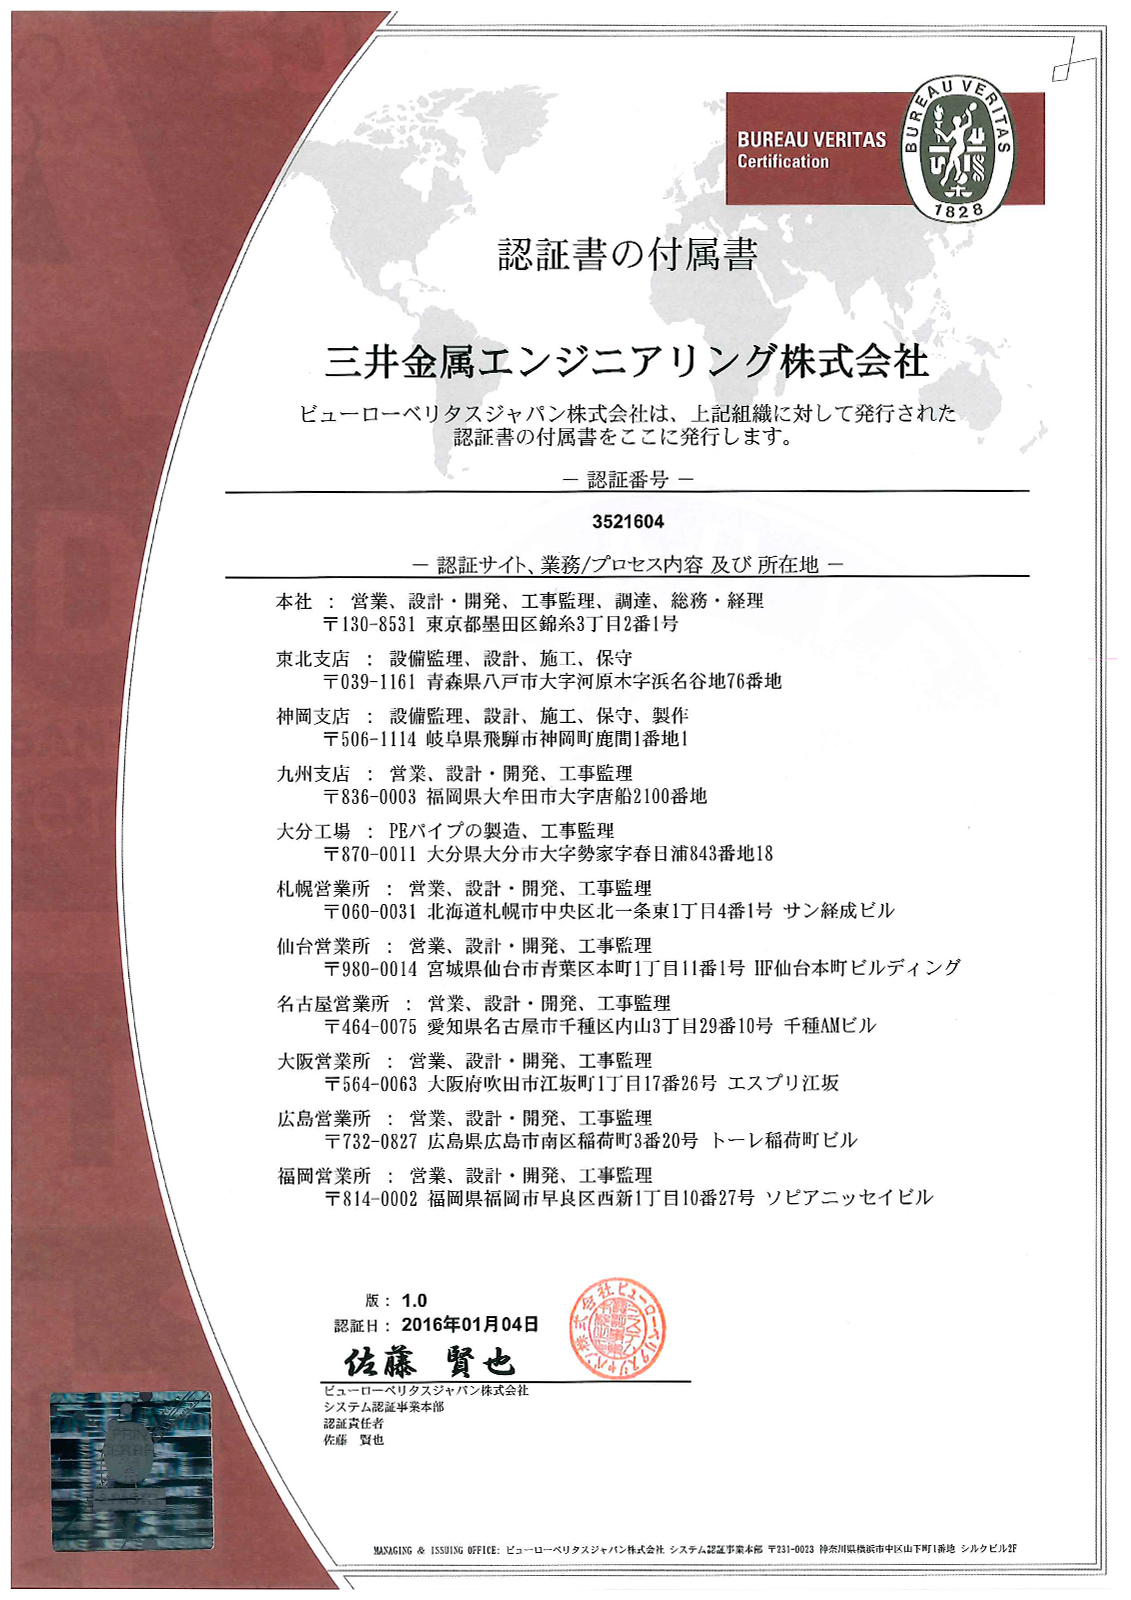 OHSAS18001(2) © MESCO 三井金属エンジニアリング株式会社